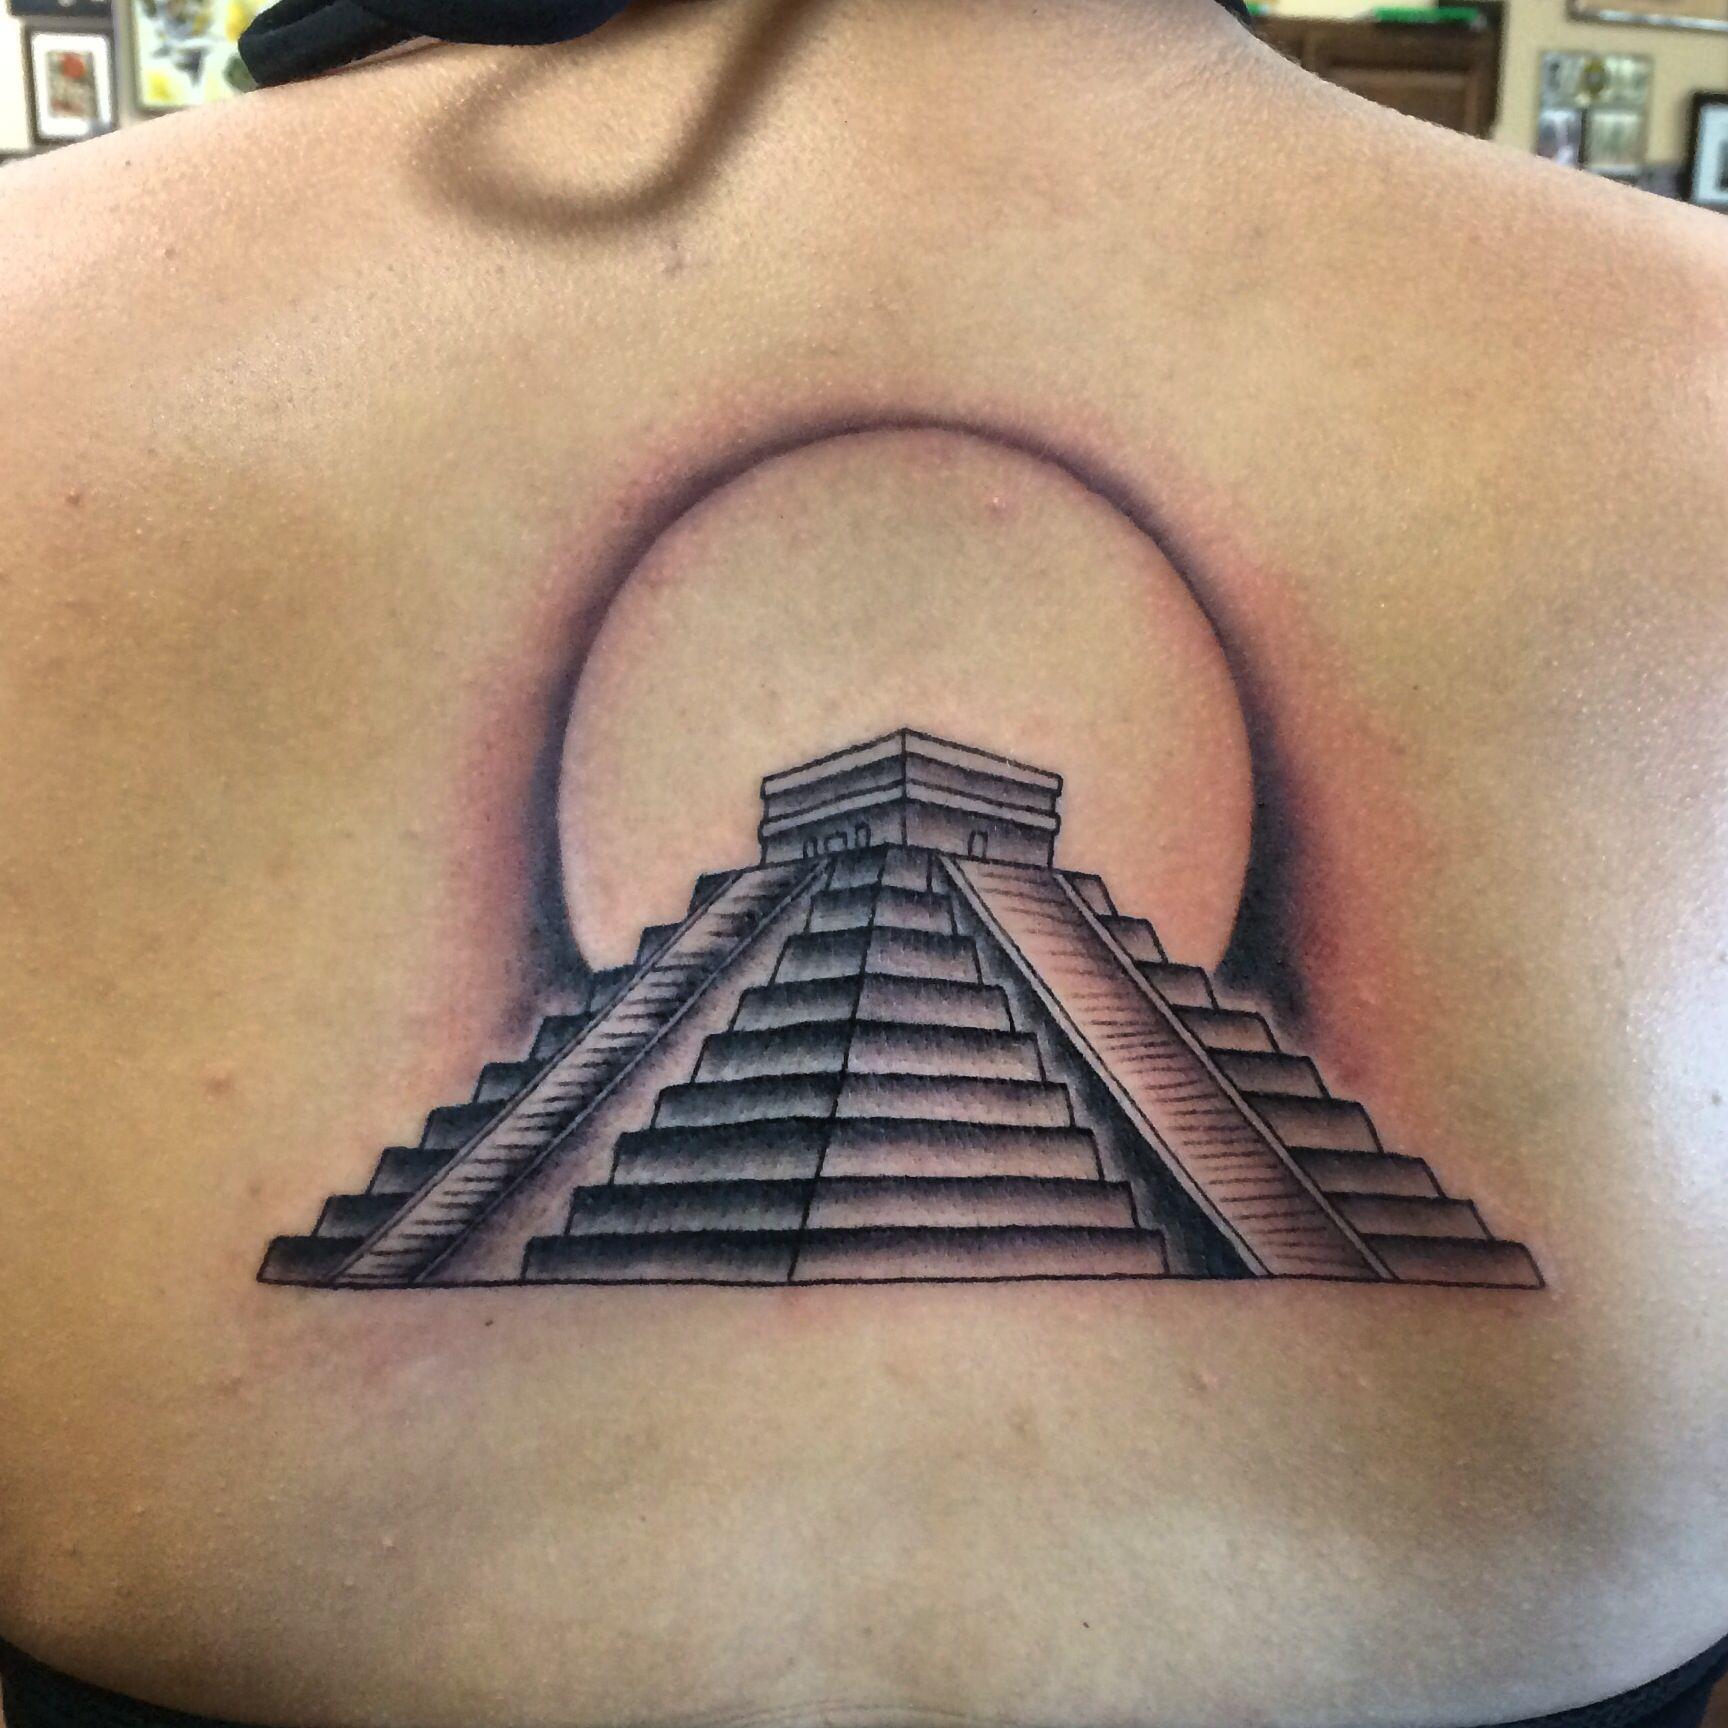 Aztec Temple Tattoo tattoo of the mayan pyramid el castillo with a moon rising